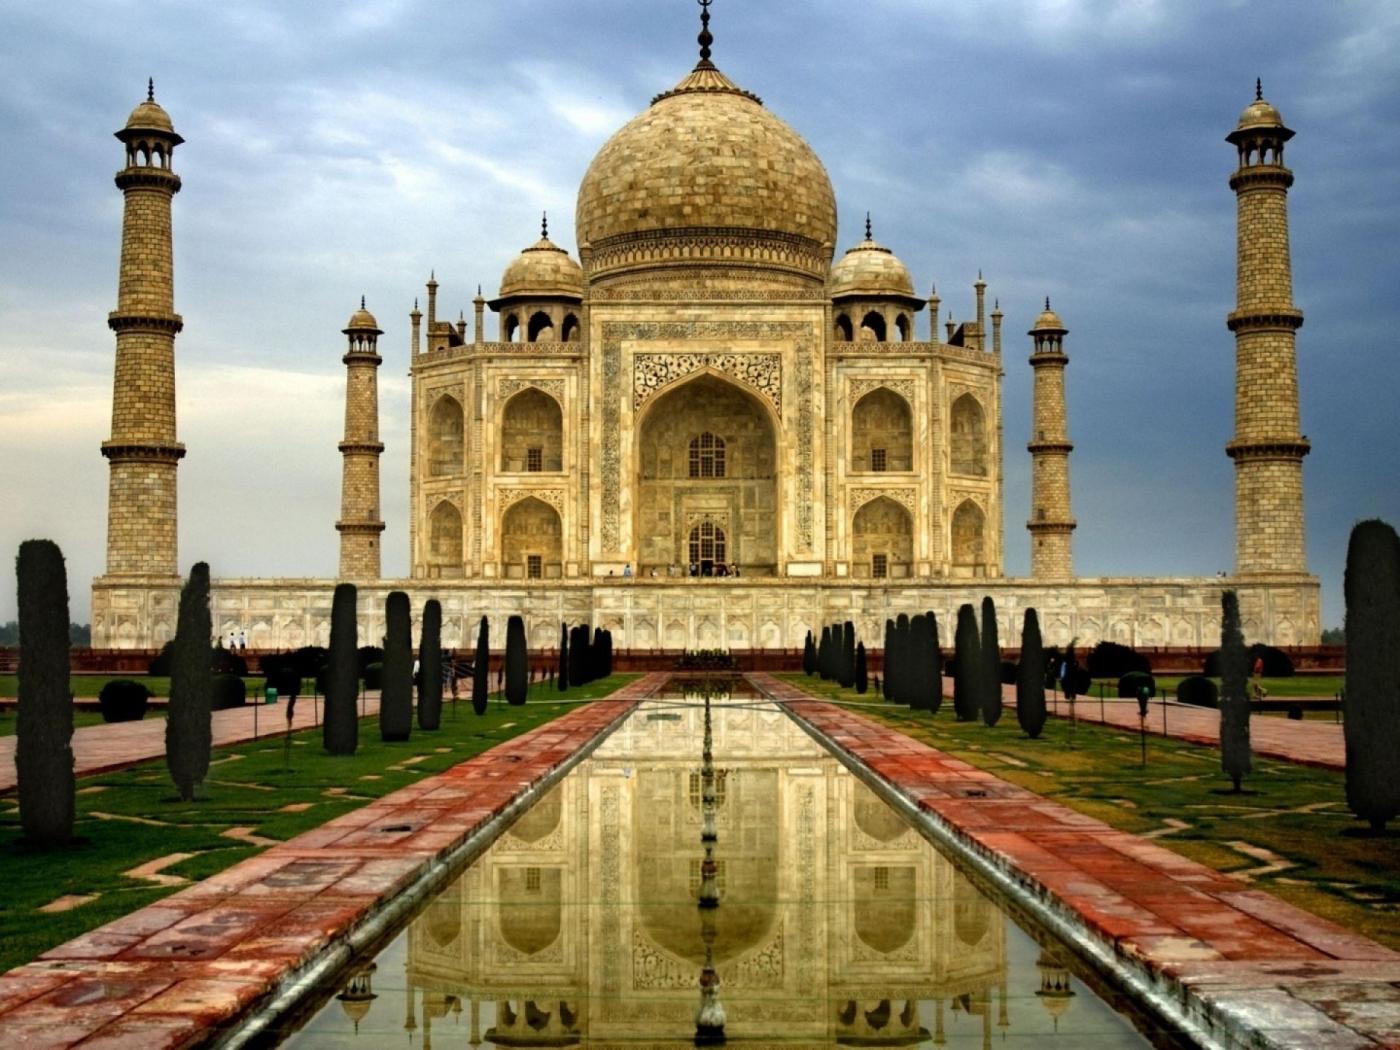 31548 скачать обои Архитектура, Тадж Махал (Taj Mahal) - заставки и картинки бесплатно